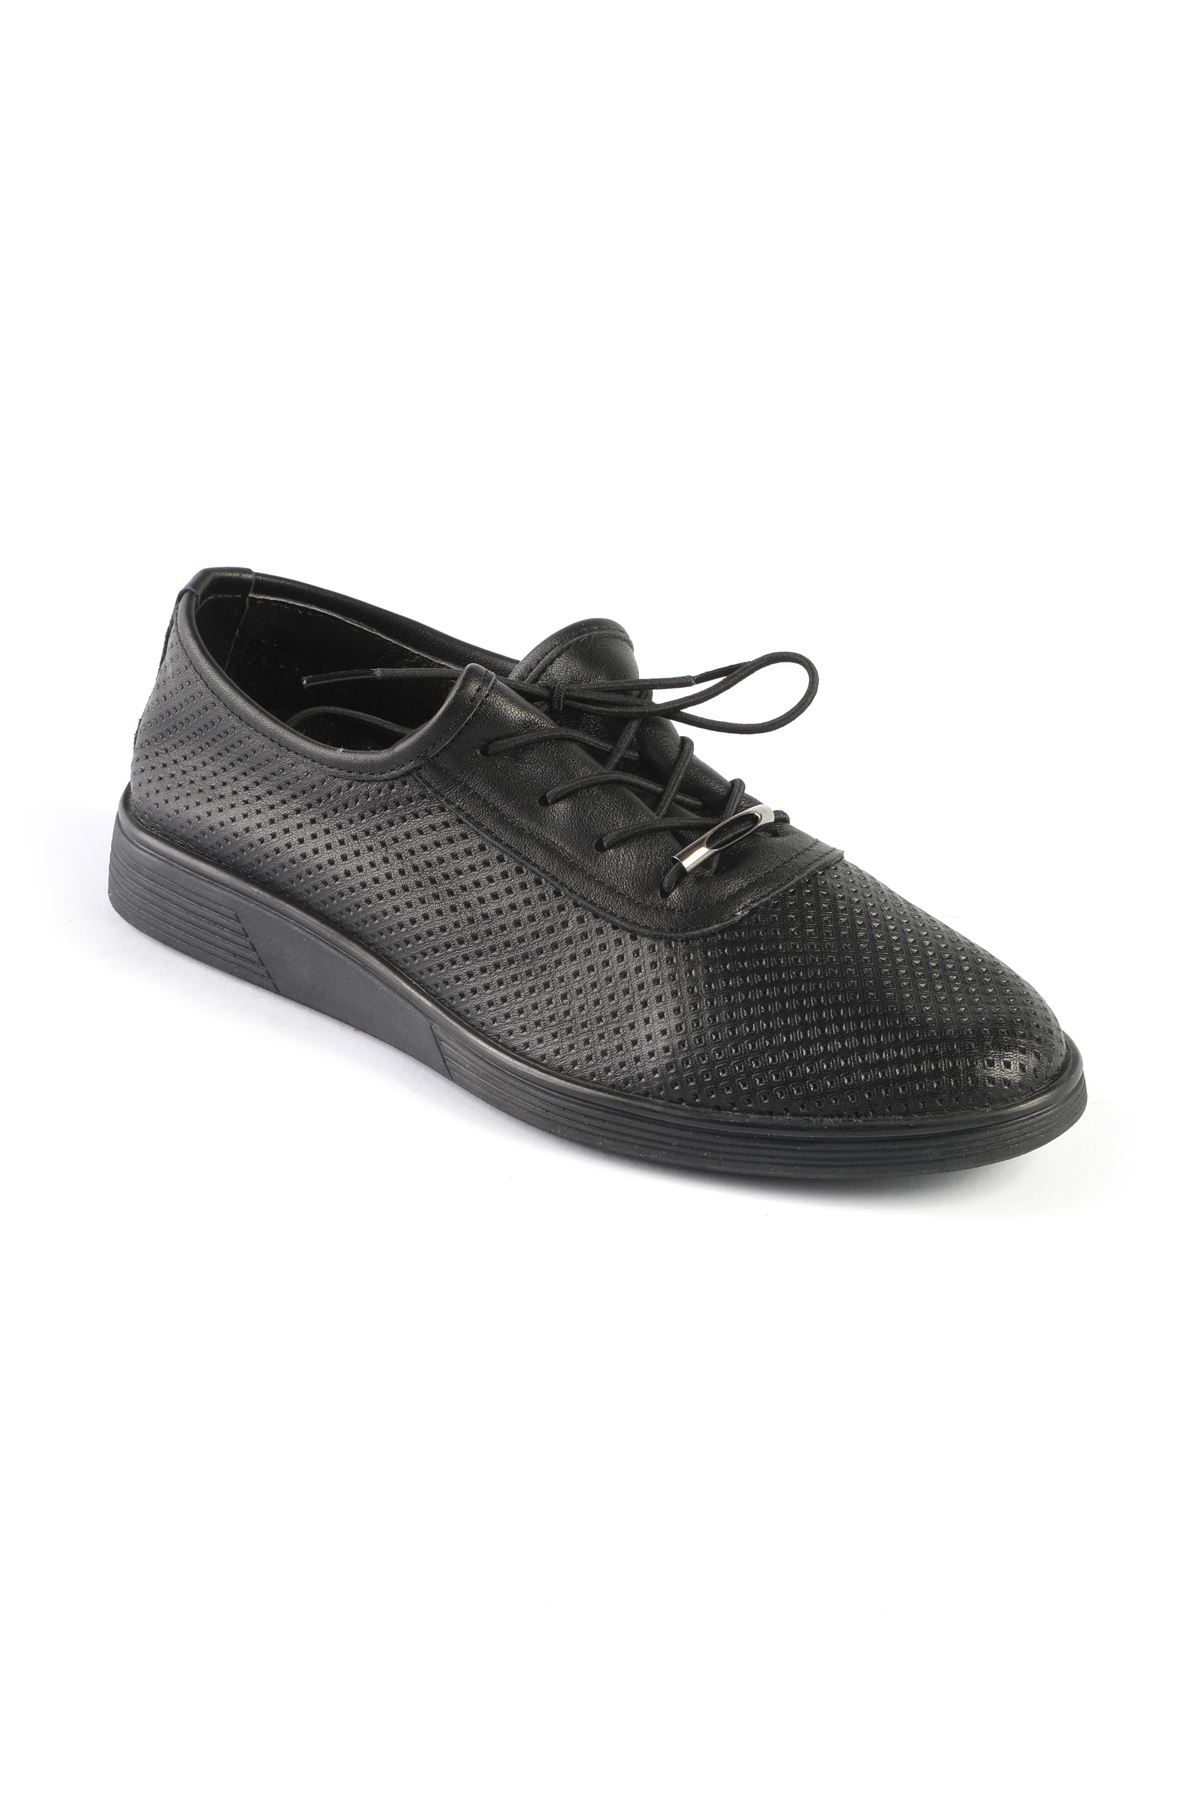 Libero FMS203 Black Sports Shoes